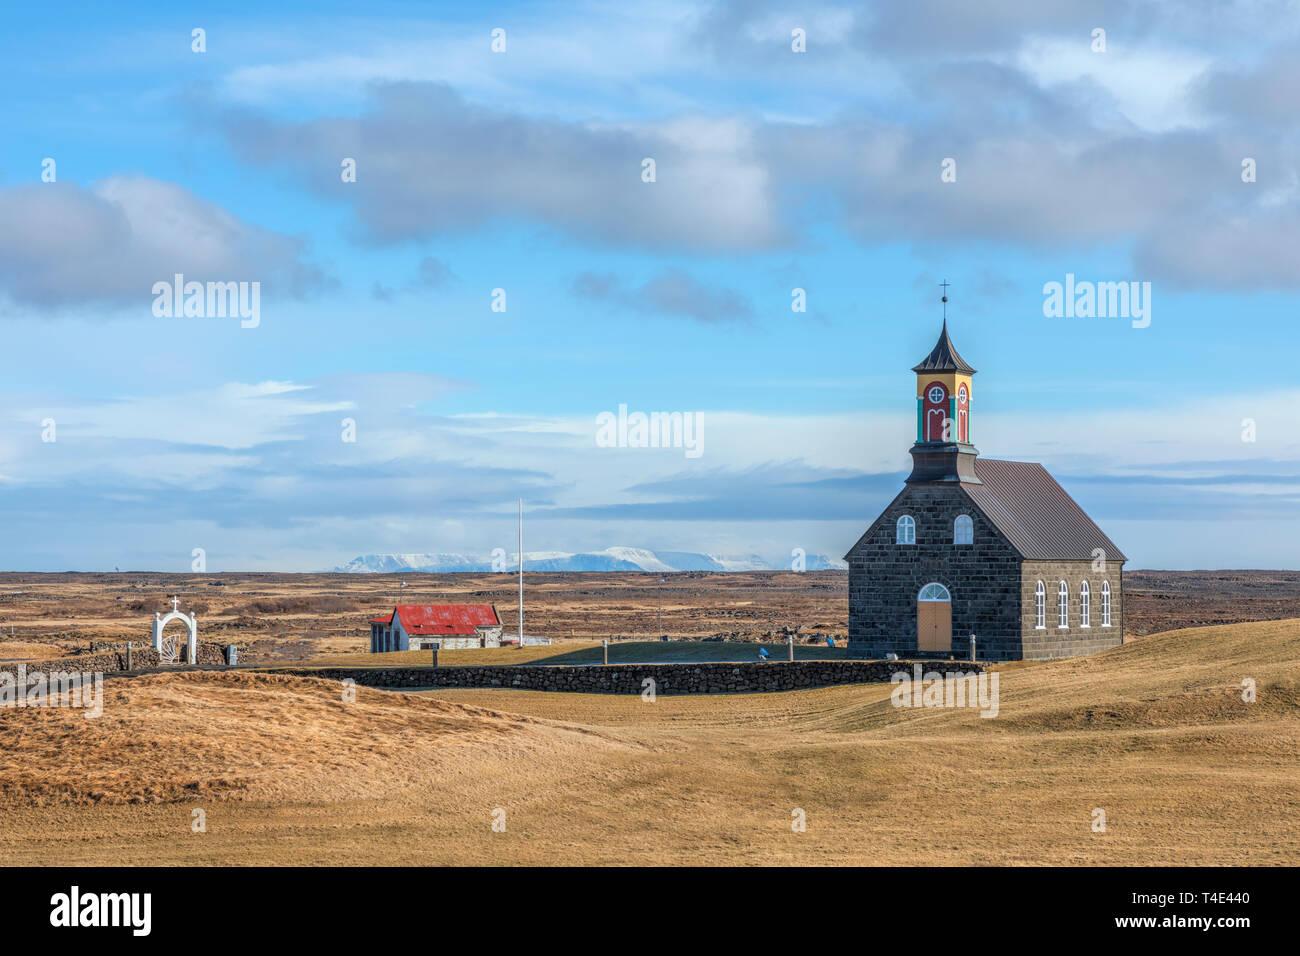 Hvalsneskirkja, Sandgerdi, Reykjanes, Sudurland, Iceland, Europe - Stock Image